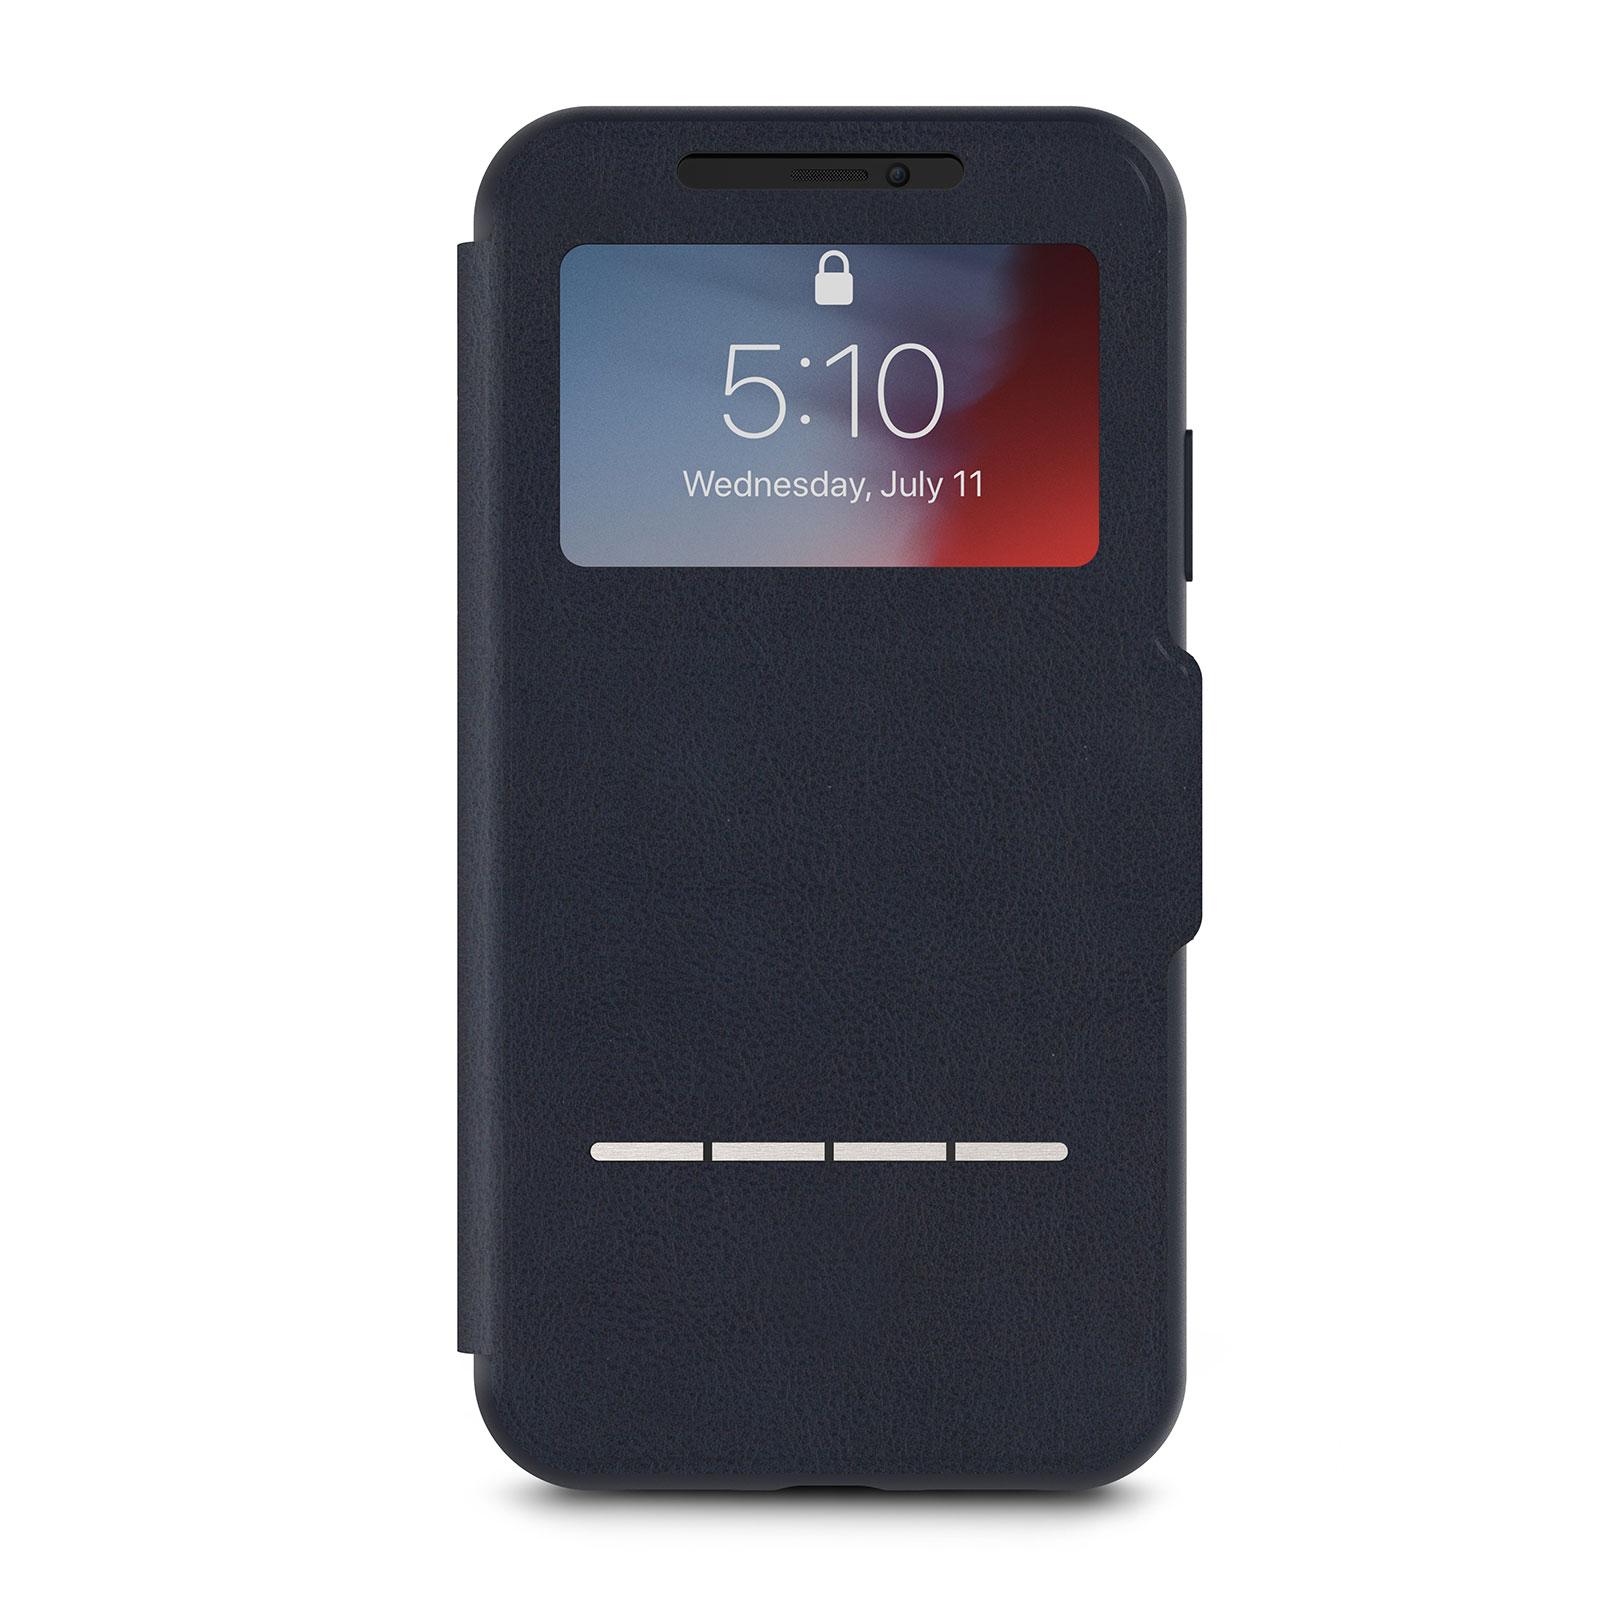 Кейс-книжка Moshi SenseCover для iPhone XR Midnight Blue аксессуар чехол moshi sensecover для iphone 6 plus graphite 99mo072304